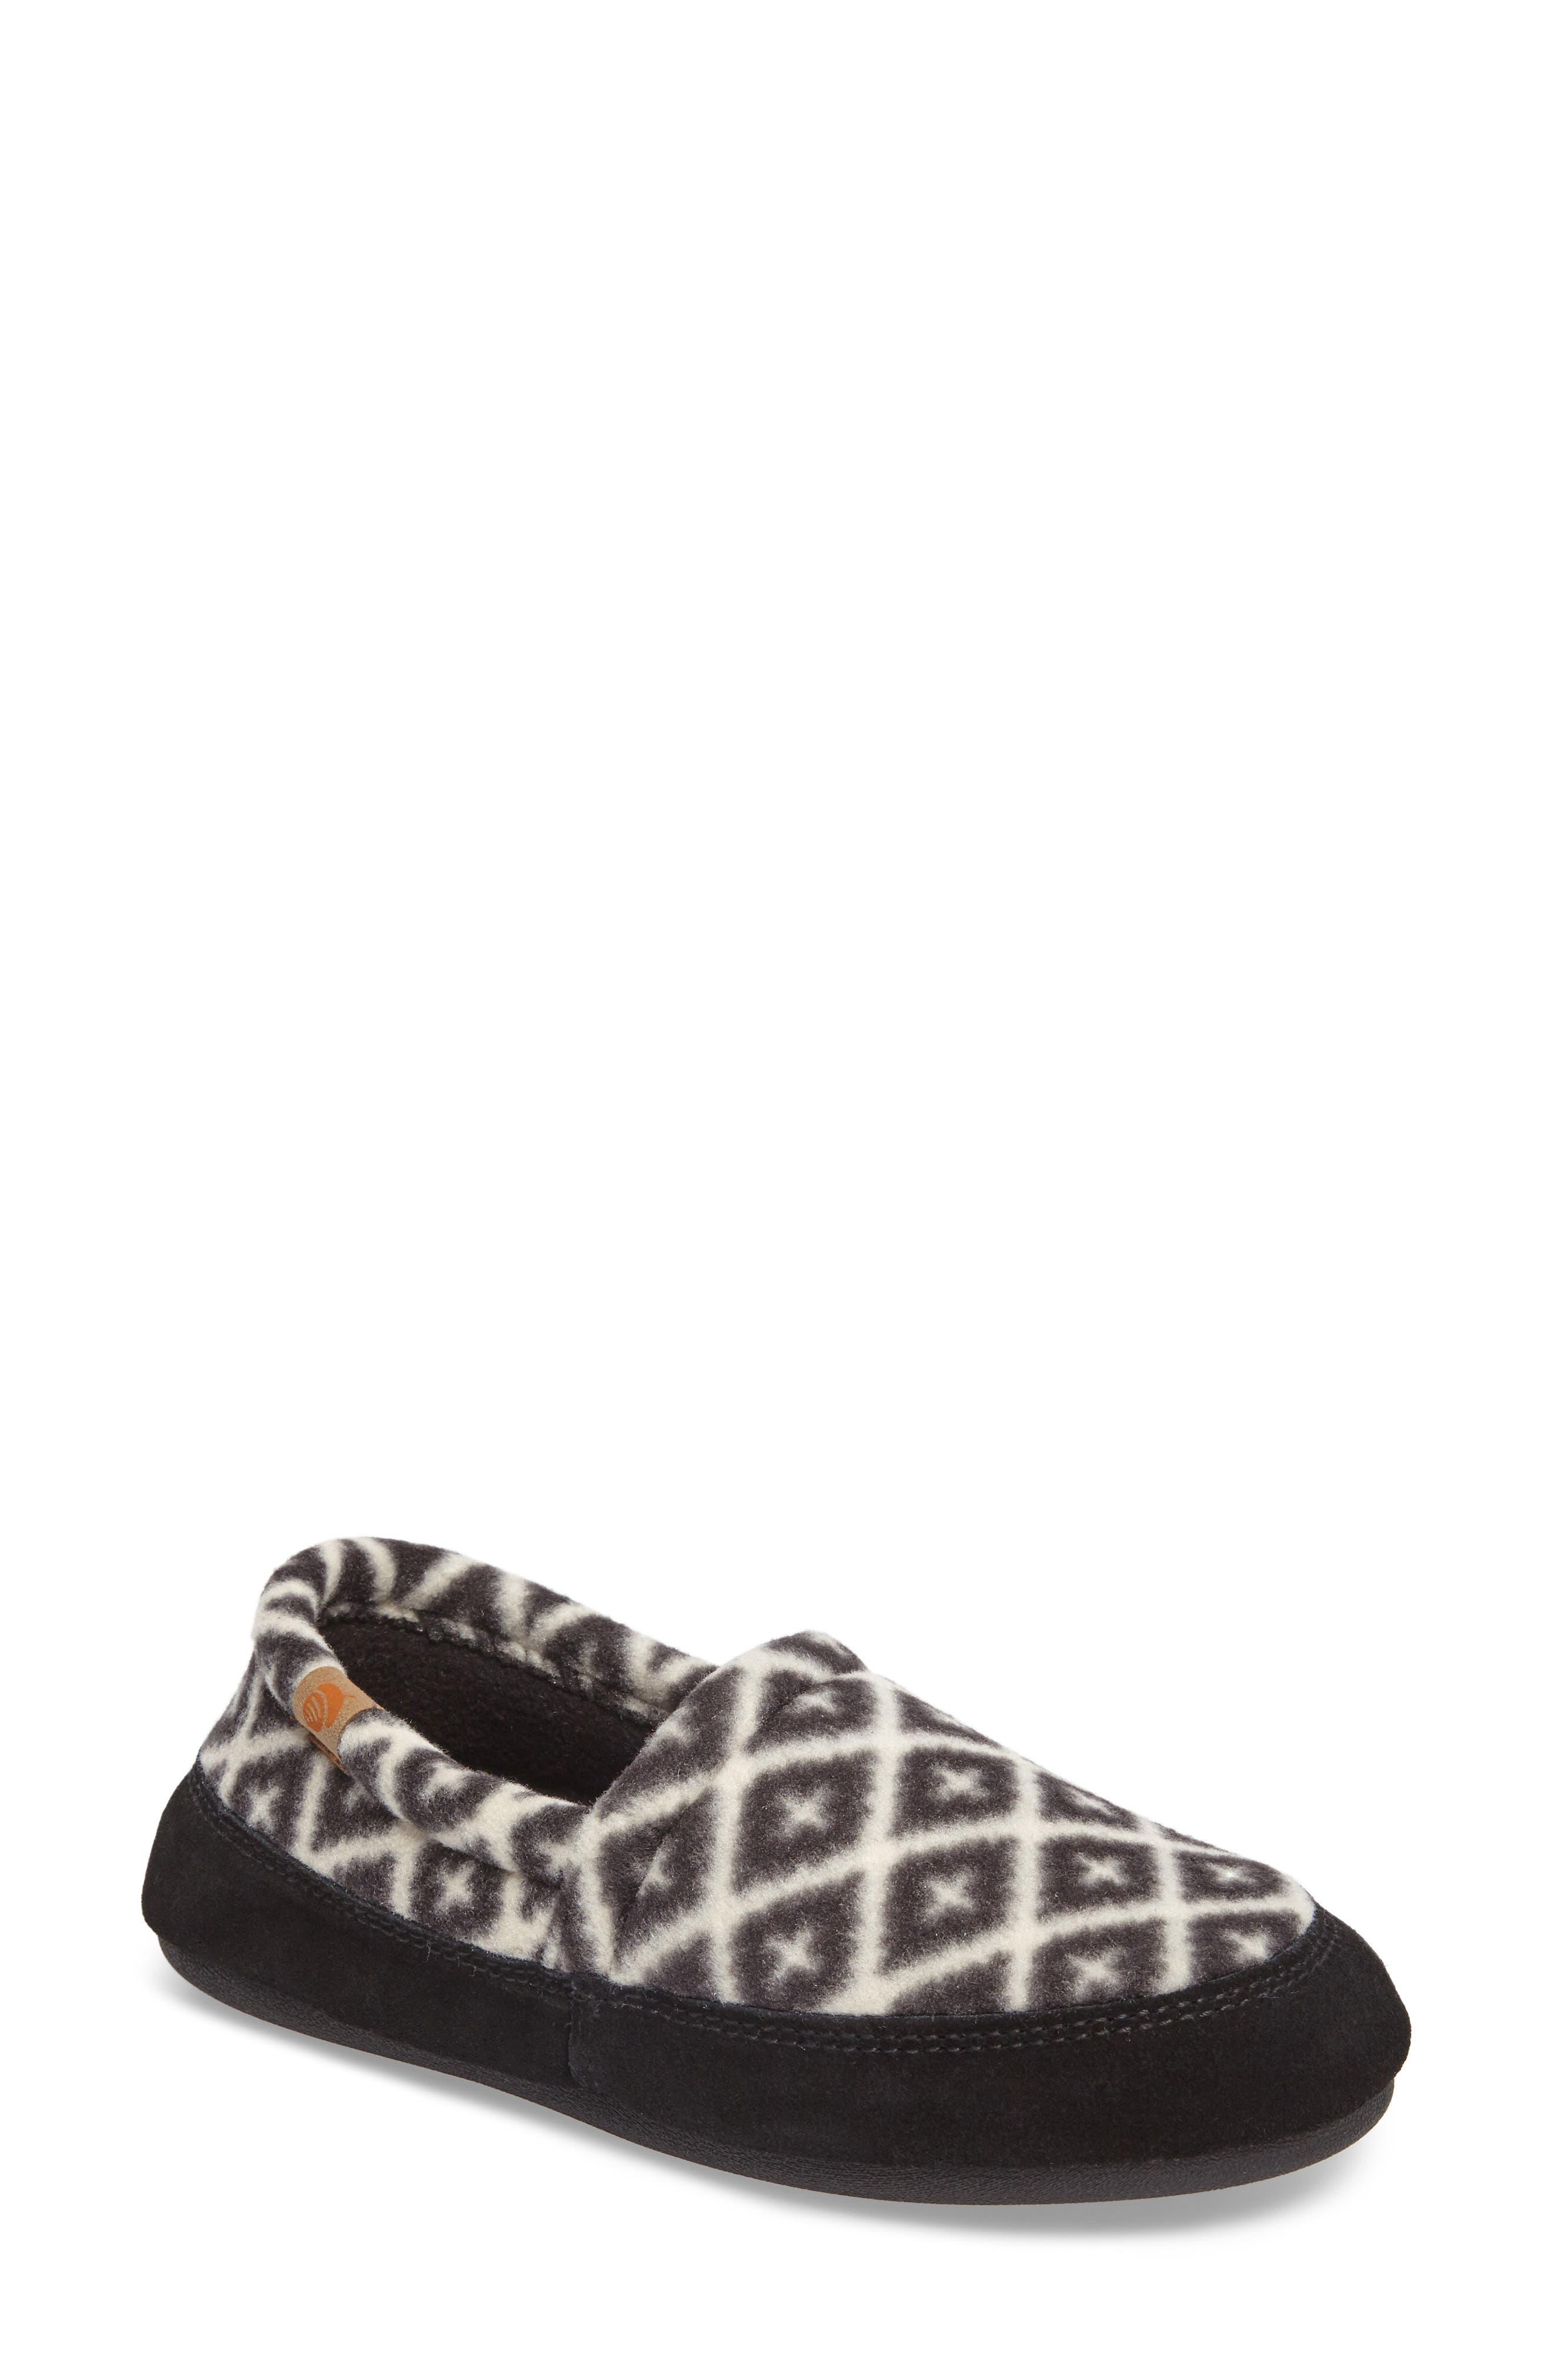 ACORN Moc Slipper, Main, color, BLACK/ CREAM SOUTHWEST